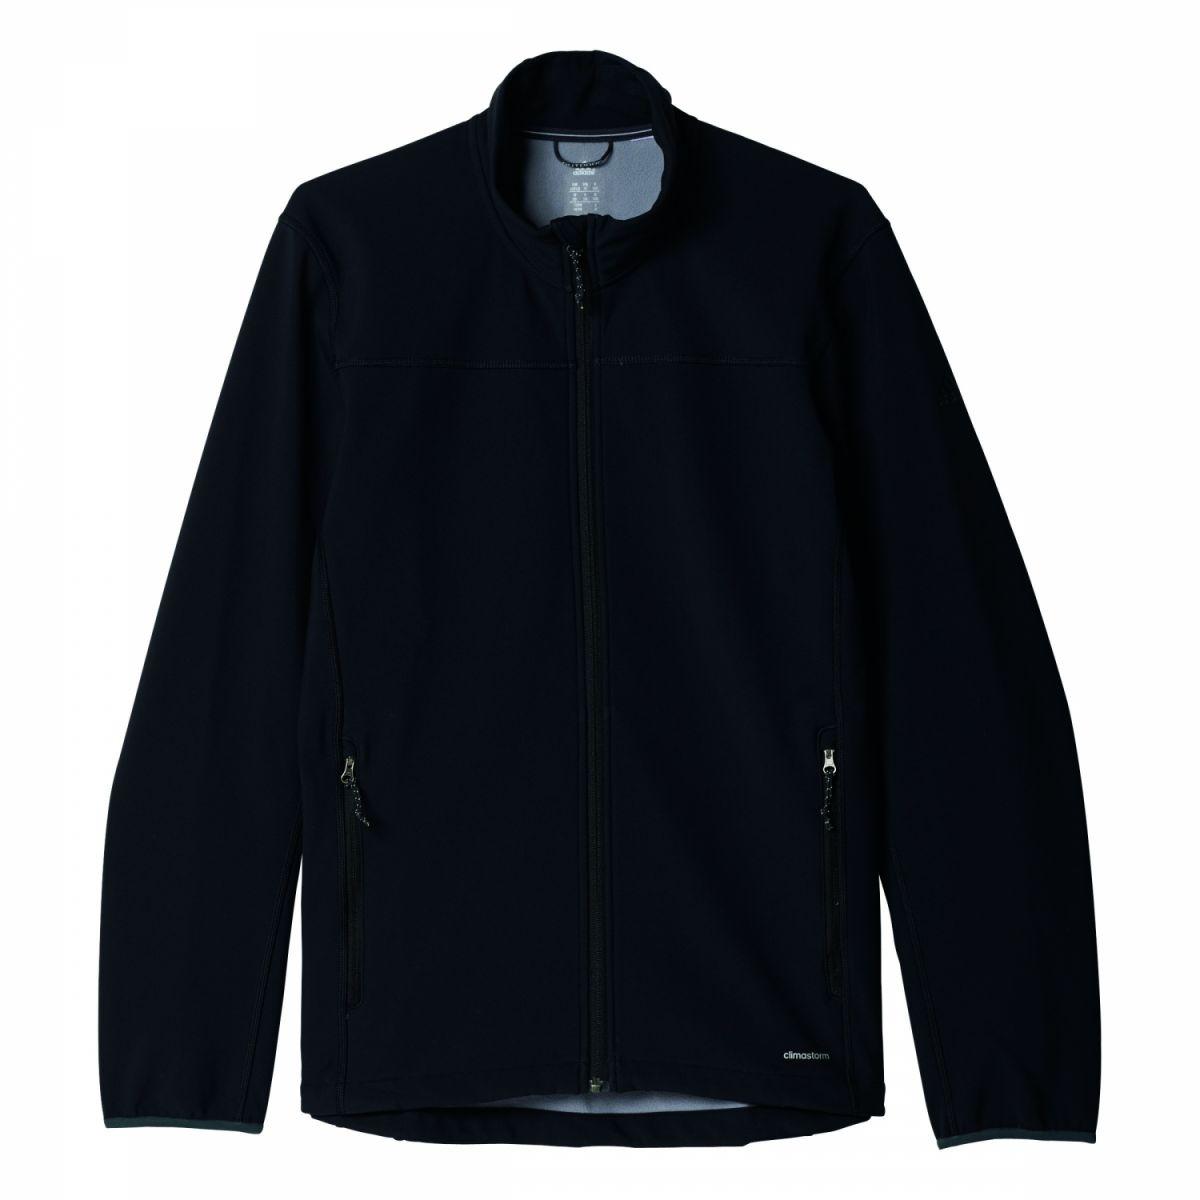 adidas softshell jacket herren jacke schwarz ai2371 sport klingenmaier. Black Bedroom Furniture Sets. Home Design Ideas